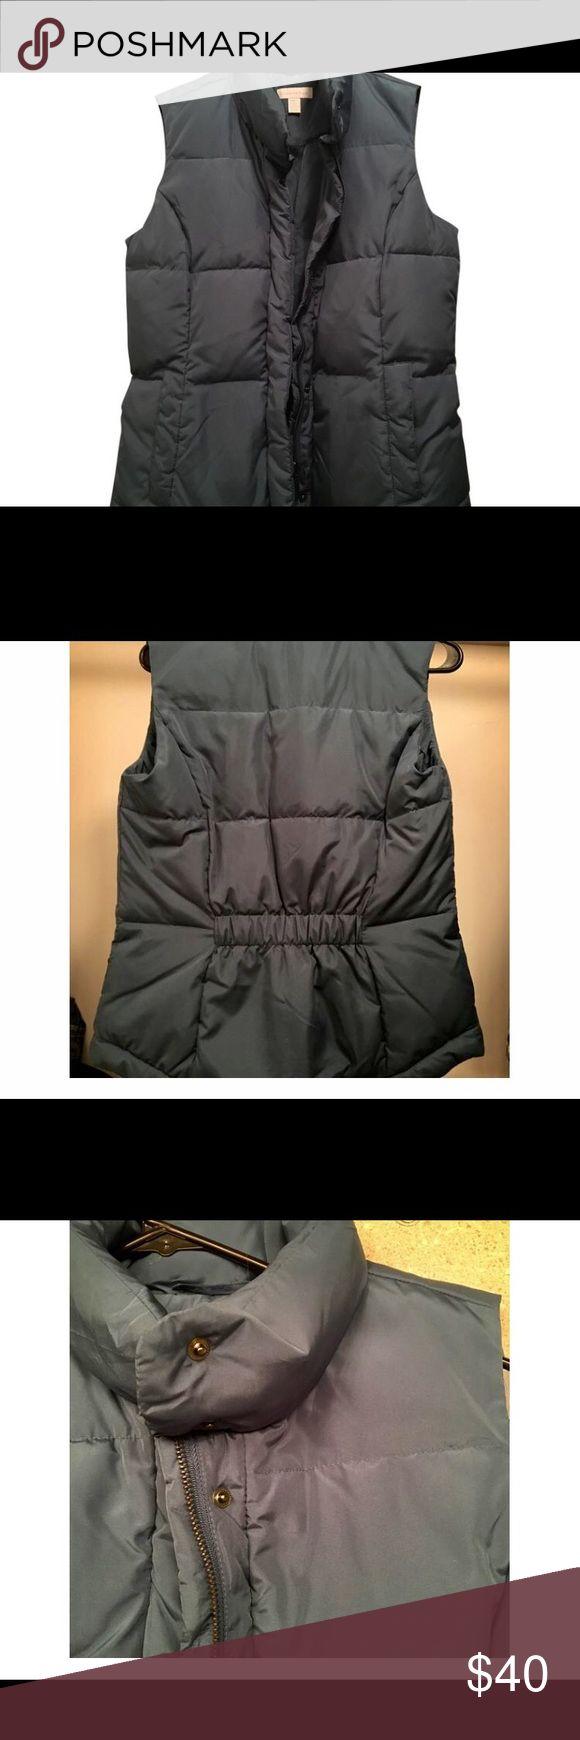 Selling this Charter Club puffy vest on Poshmark! My username is: kivog. #shopmycloset #poshmark #fashion #shopping #style #forsale #Charter Club #Jackets & Blazers